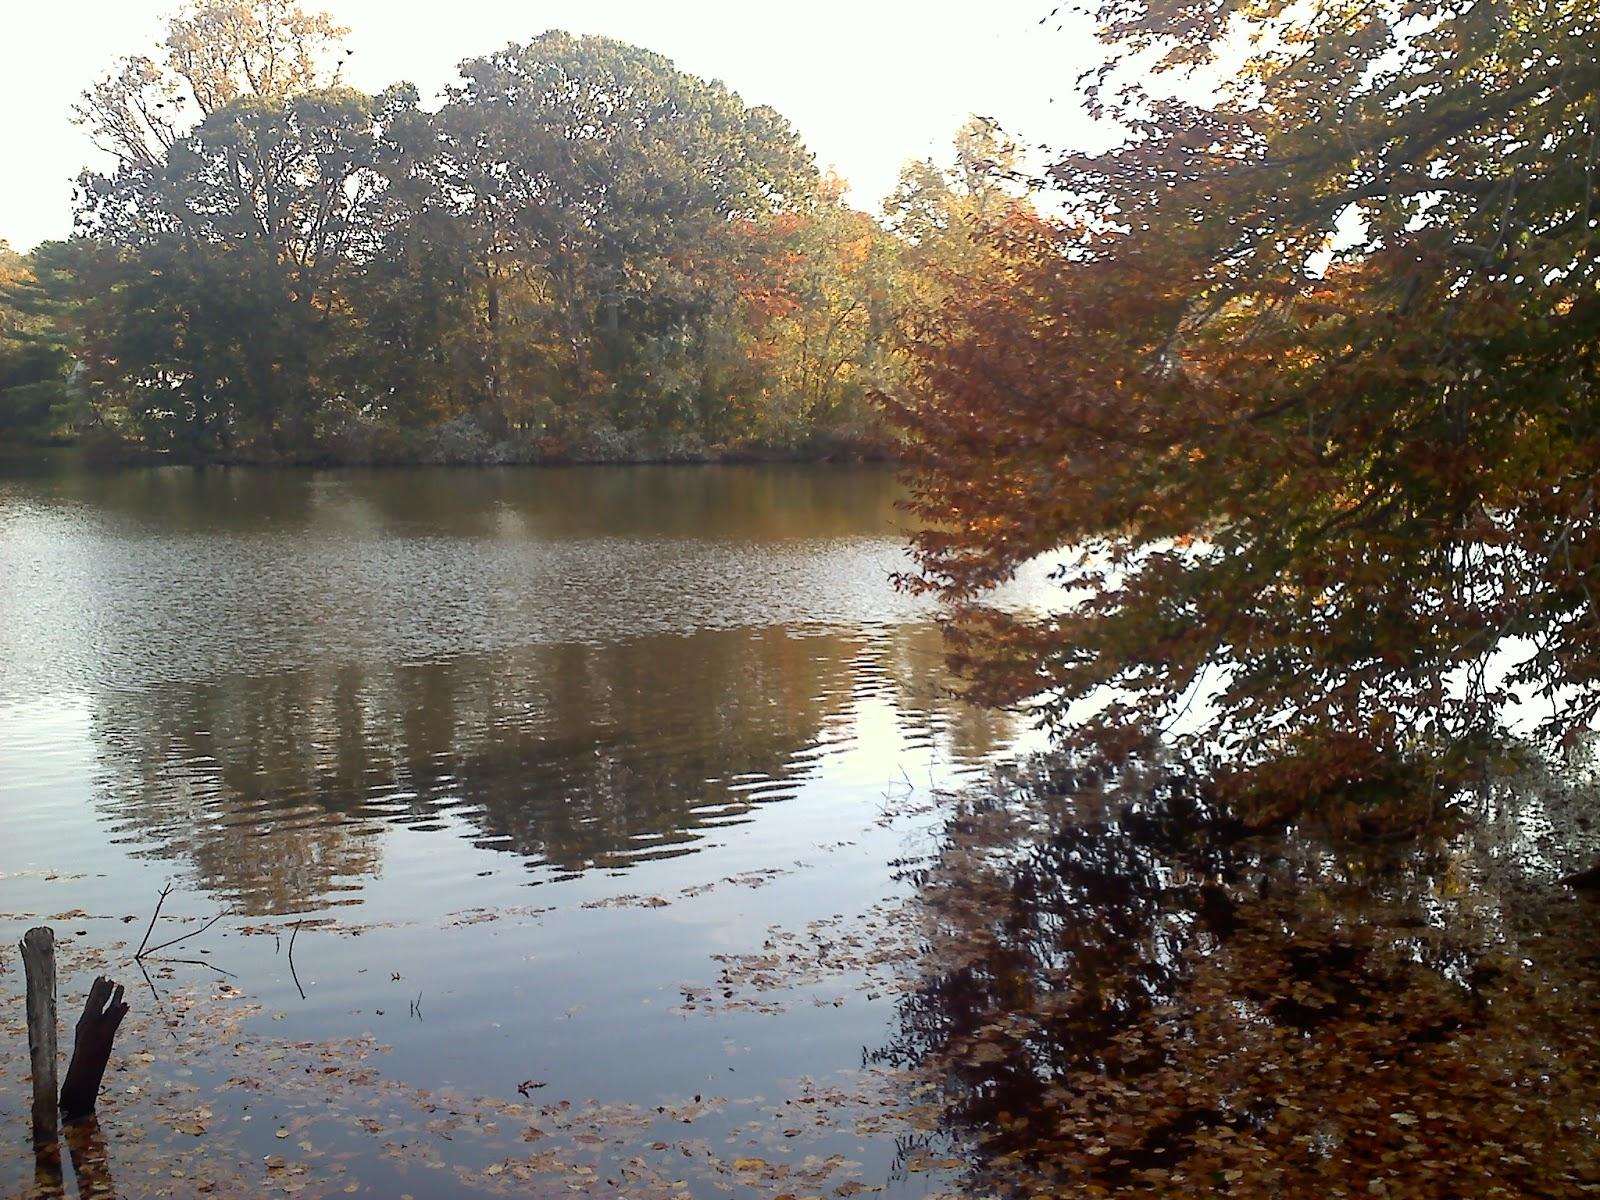 Homemade on Long Island: Avalon Park and Preserve